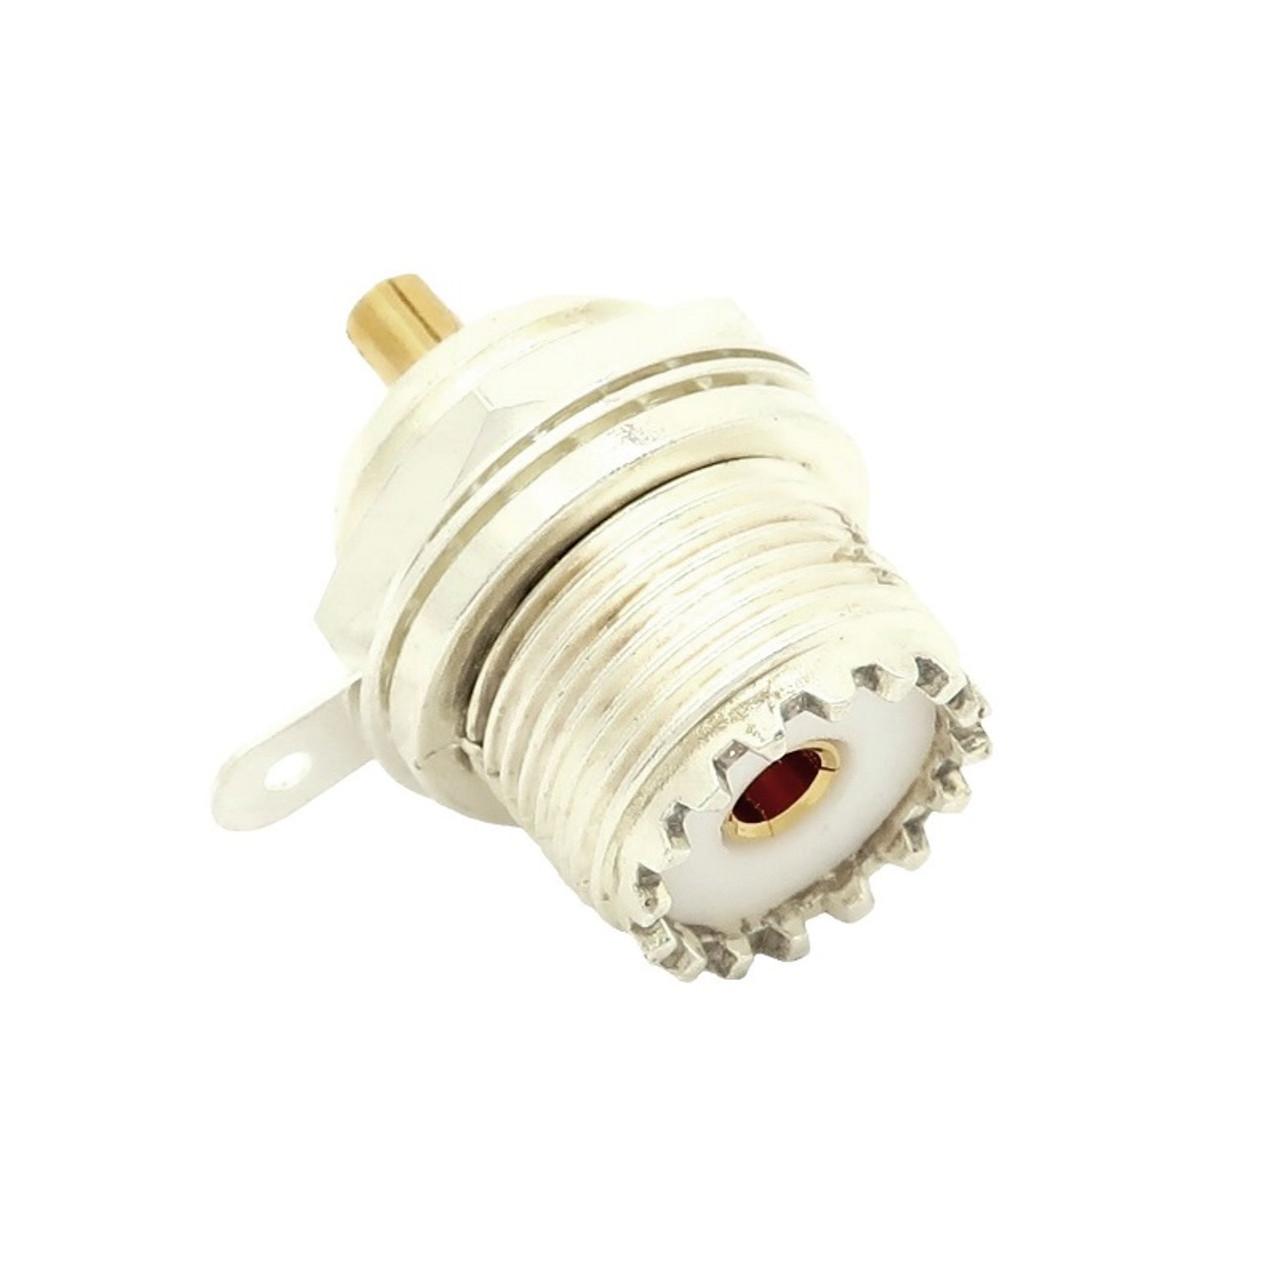 UHF-Female SO-239 Bulkhead Panel Coaxial Connector